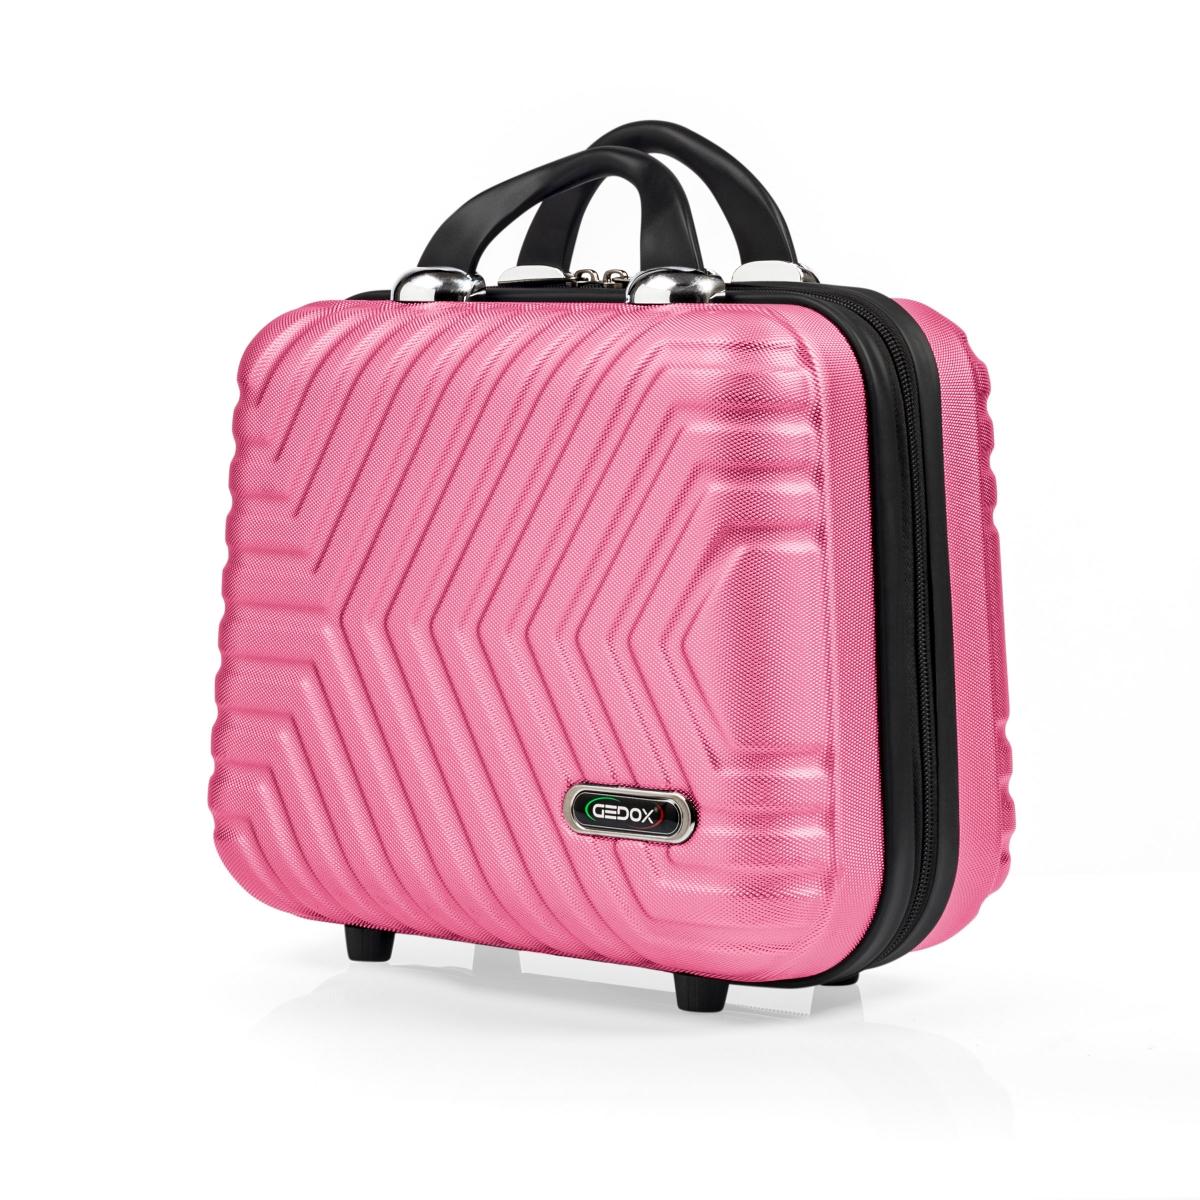 G&D Polo Suitcase Abs Makyaj&Hostes El Çantası Model:615.11 Pudra Pembe